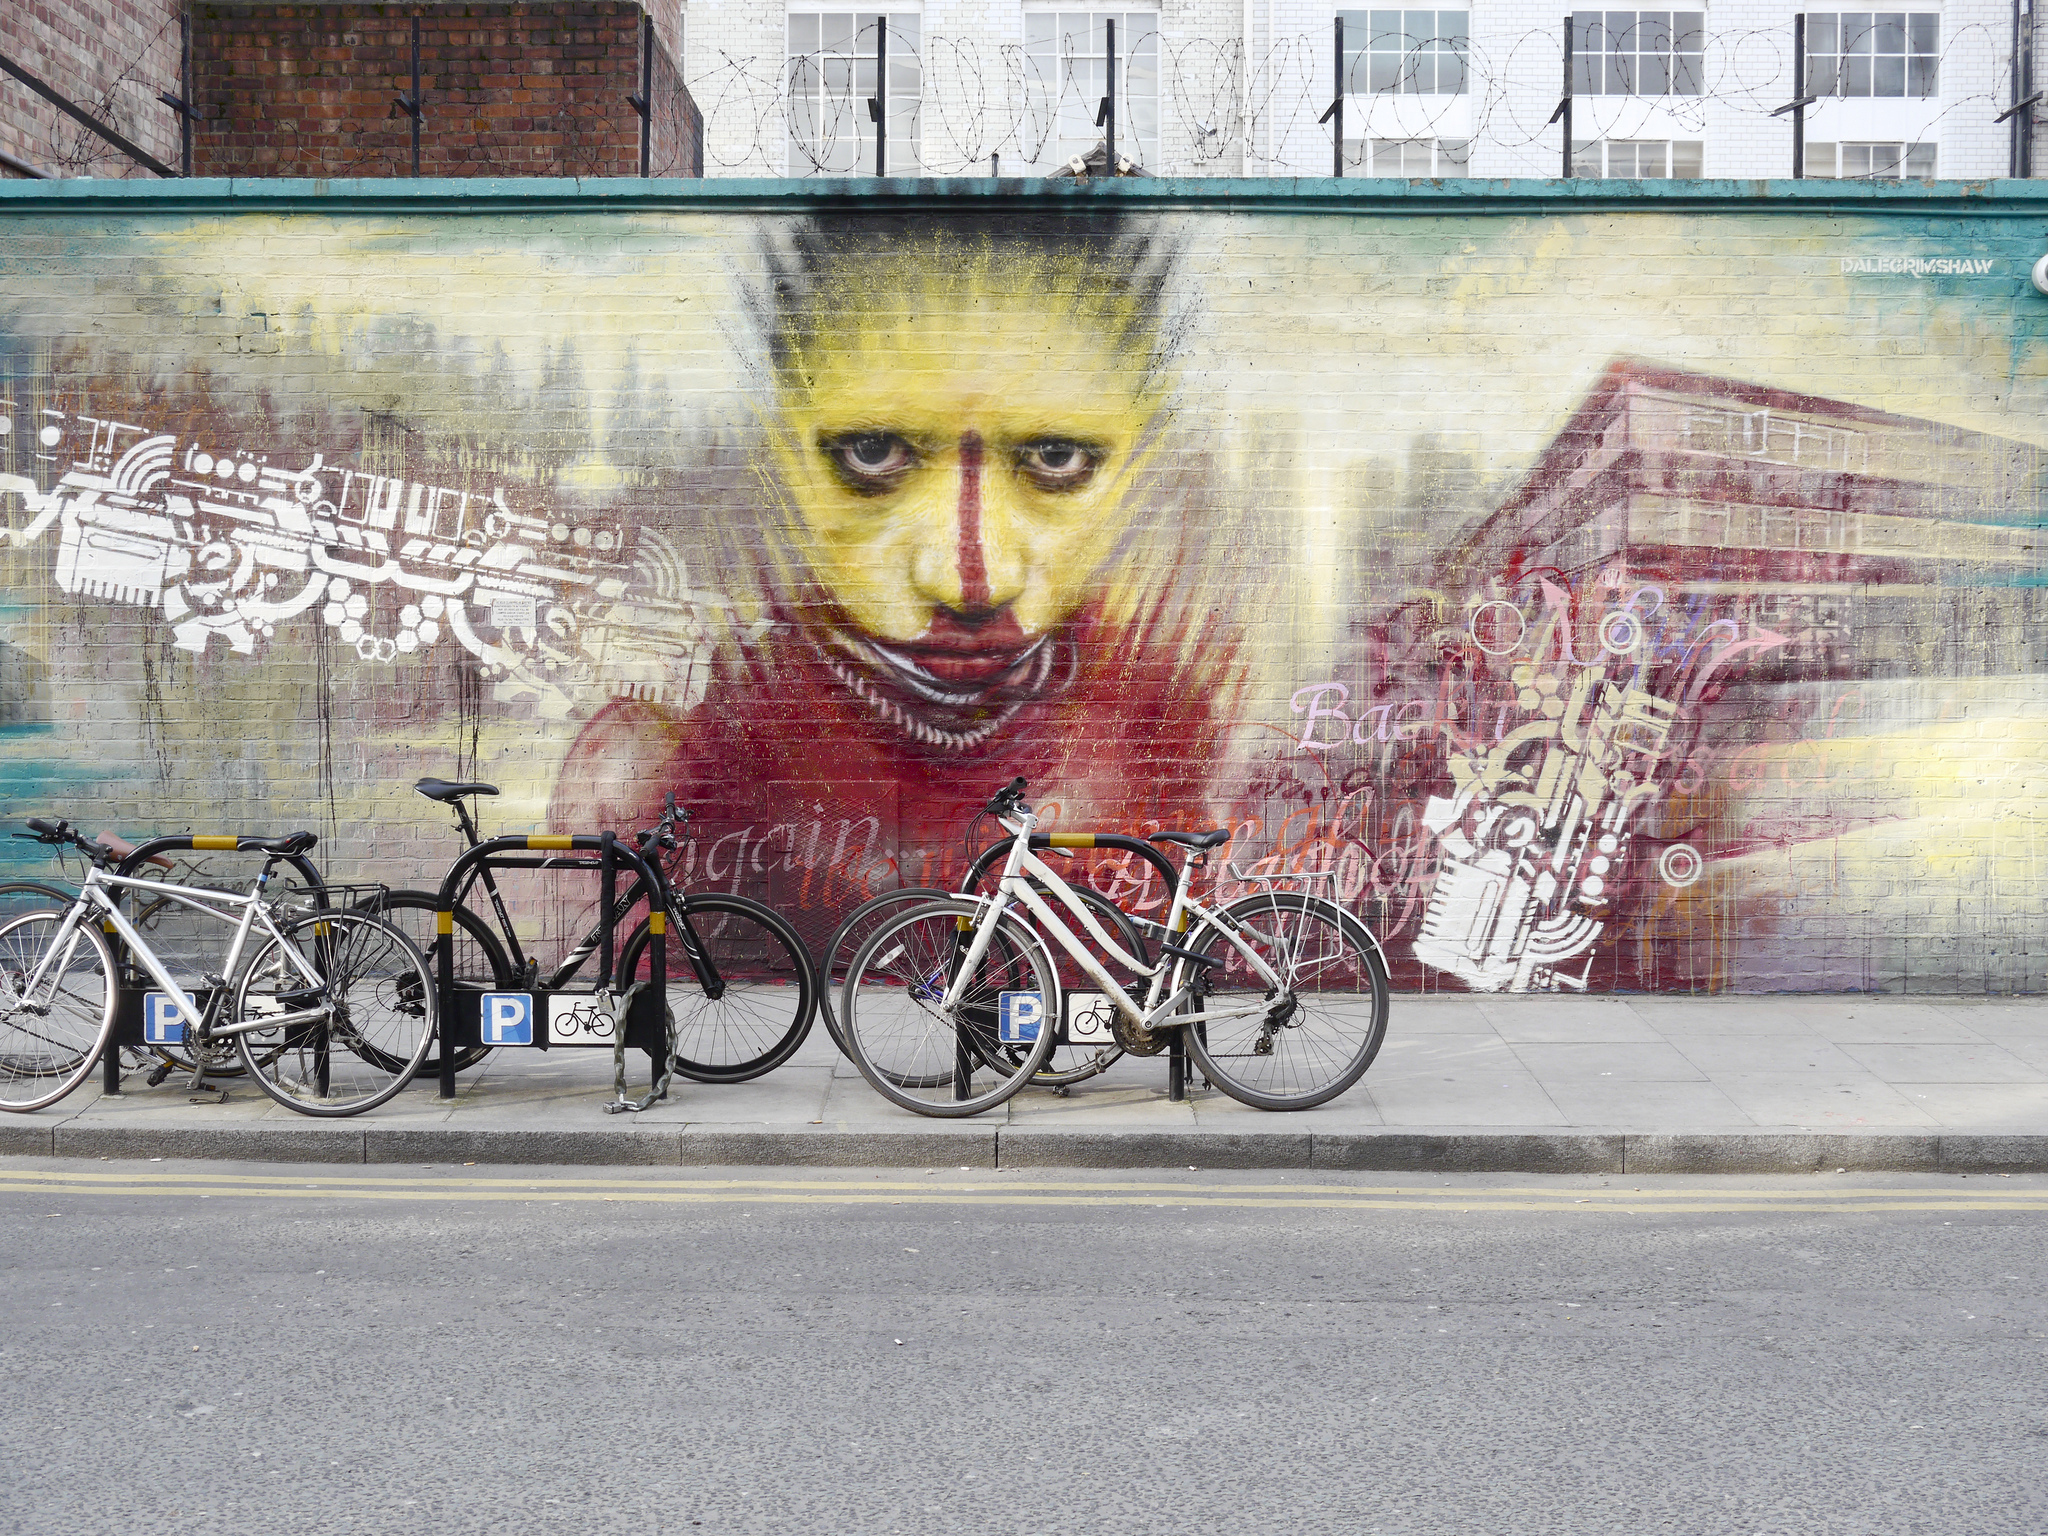 Dale Grimshaw, Clifton Street, Hoxton